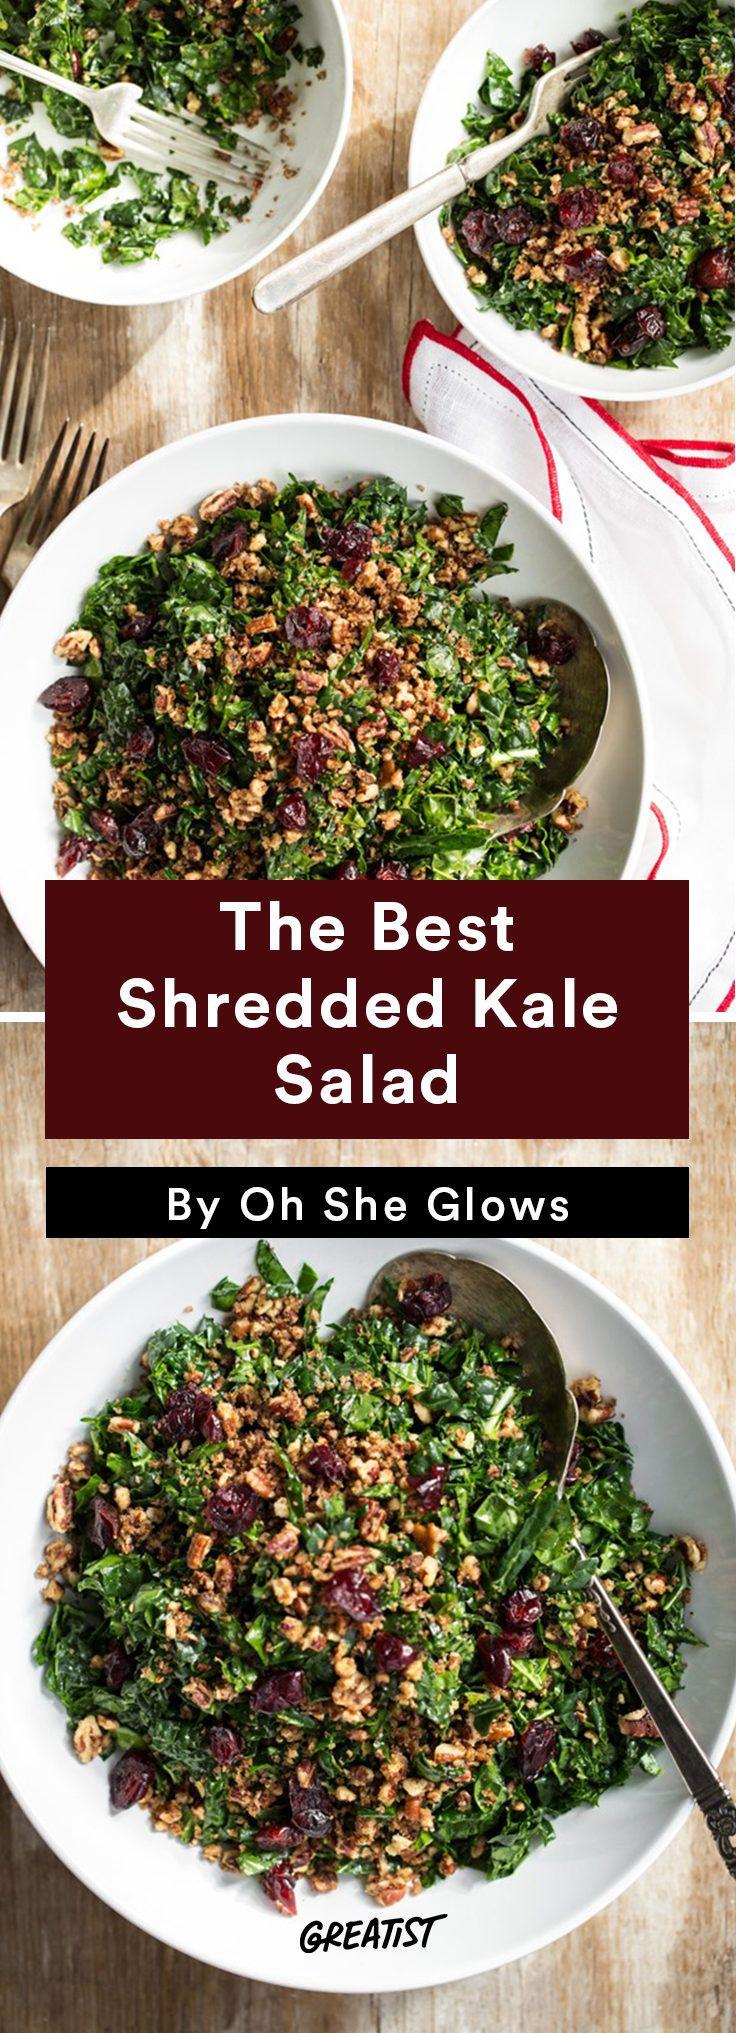 We'll meet you at the bottom. #vegan #bowl #recipes https://greatist.com/eat/vegan-bowl-recipes-we-cant-get-enough-of